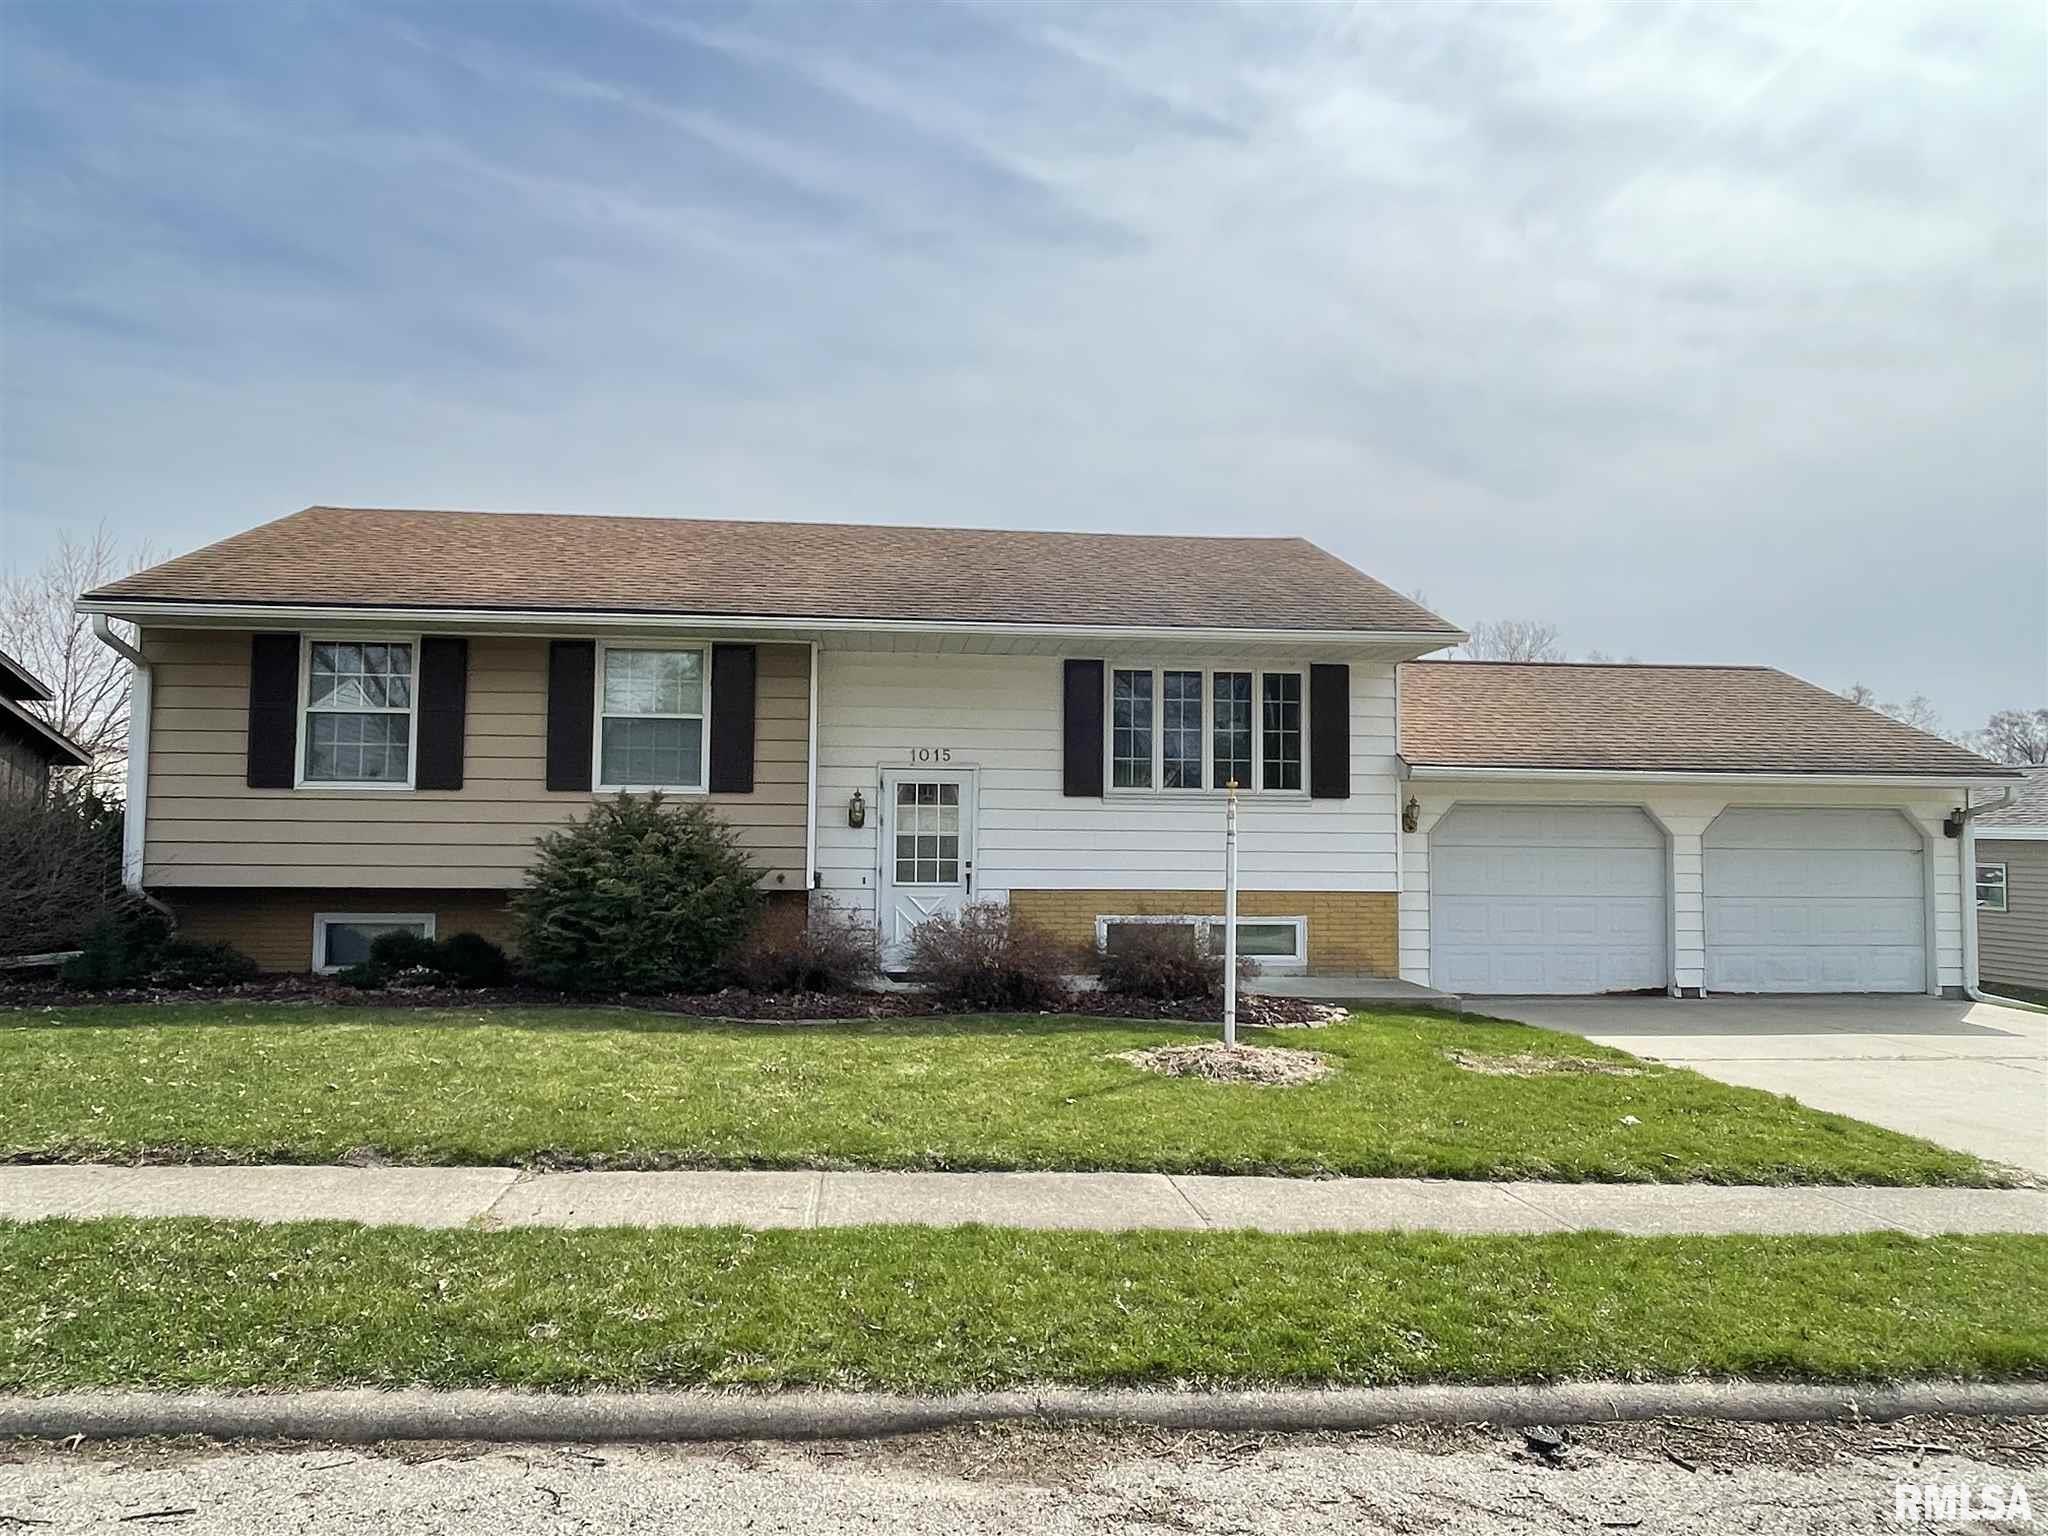 1015 SUNCREST Property Photo - Fulton, IL real estate listing